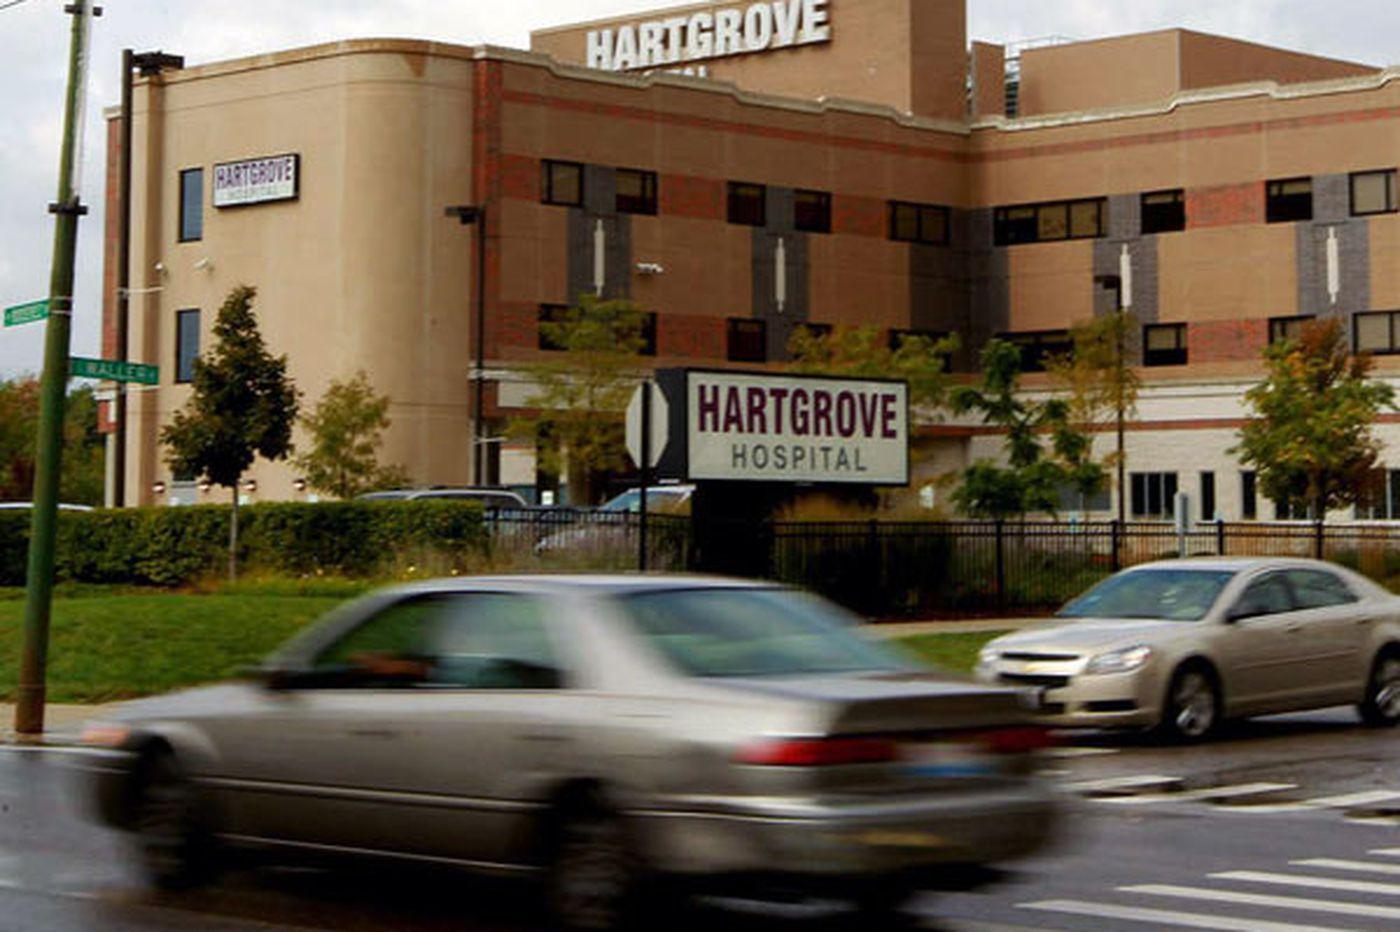 Universal Health Services says it's under criminal investigation